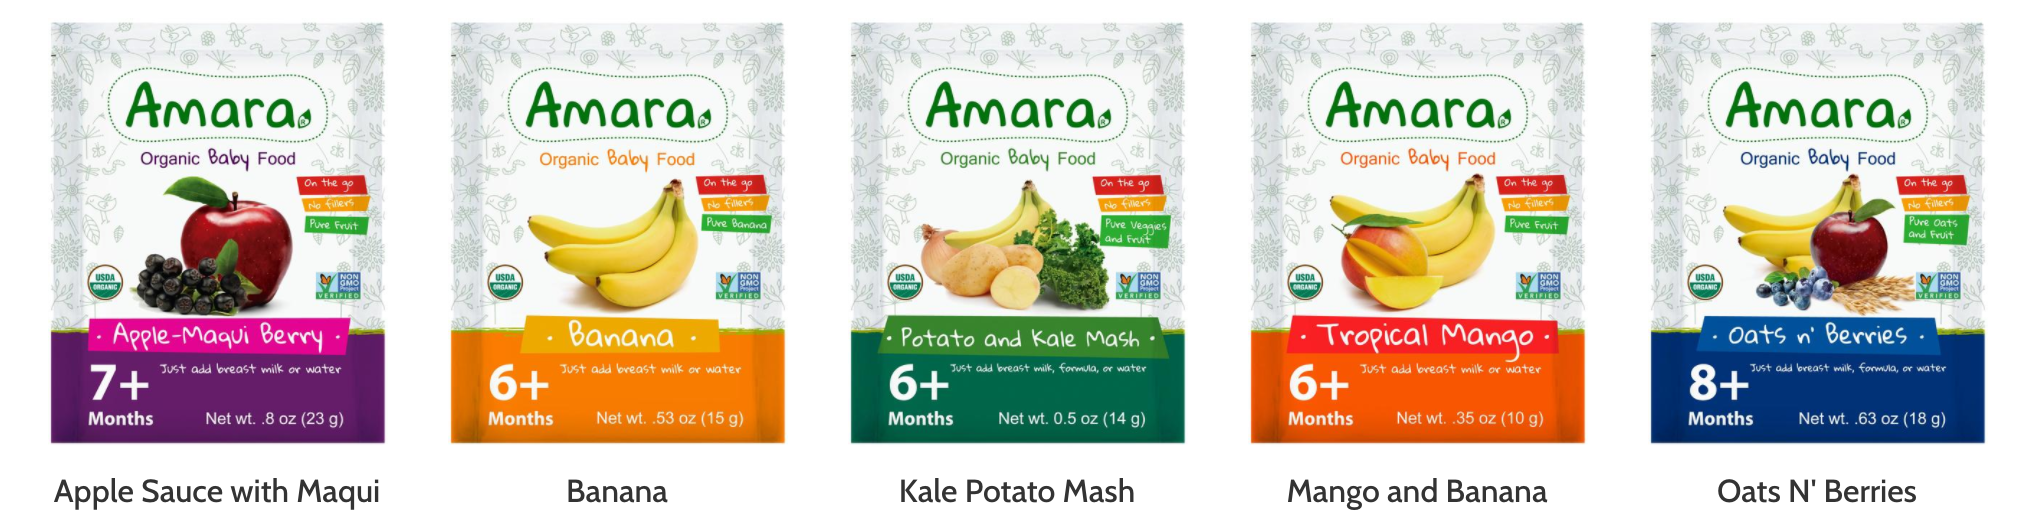 Amara Organic Food